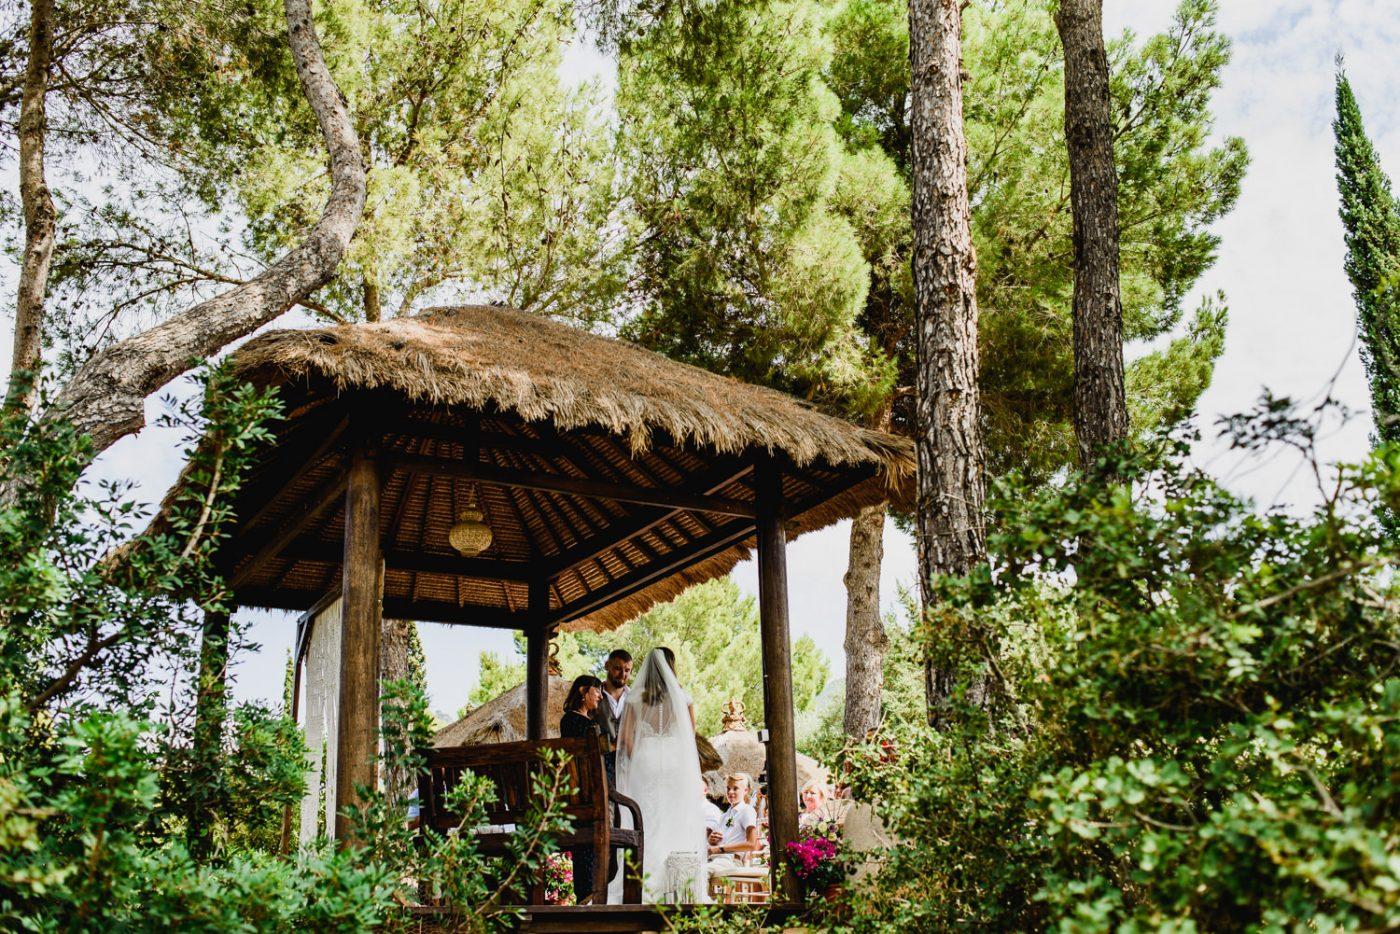 Païssa d'en Bernat Wedding Venue